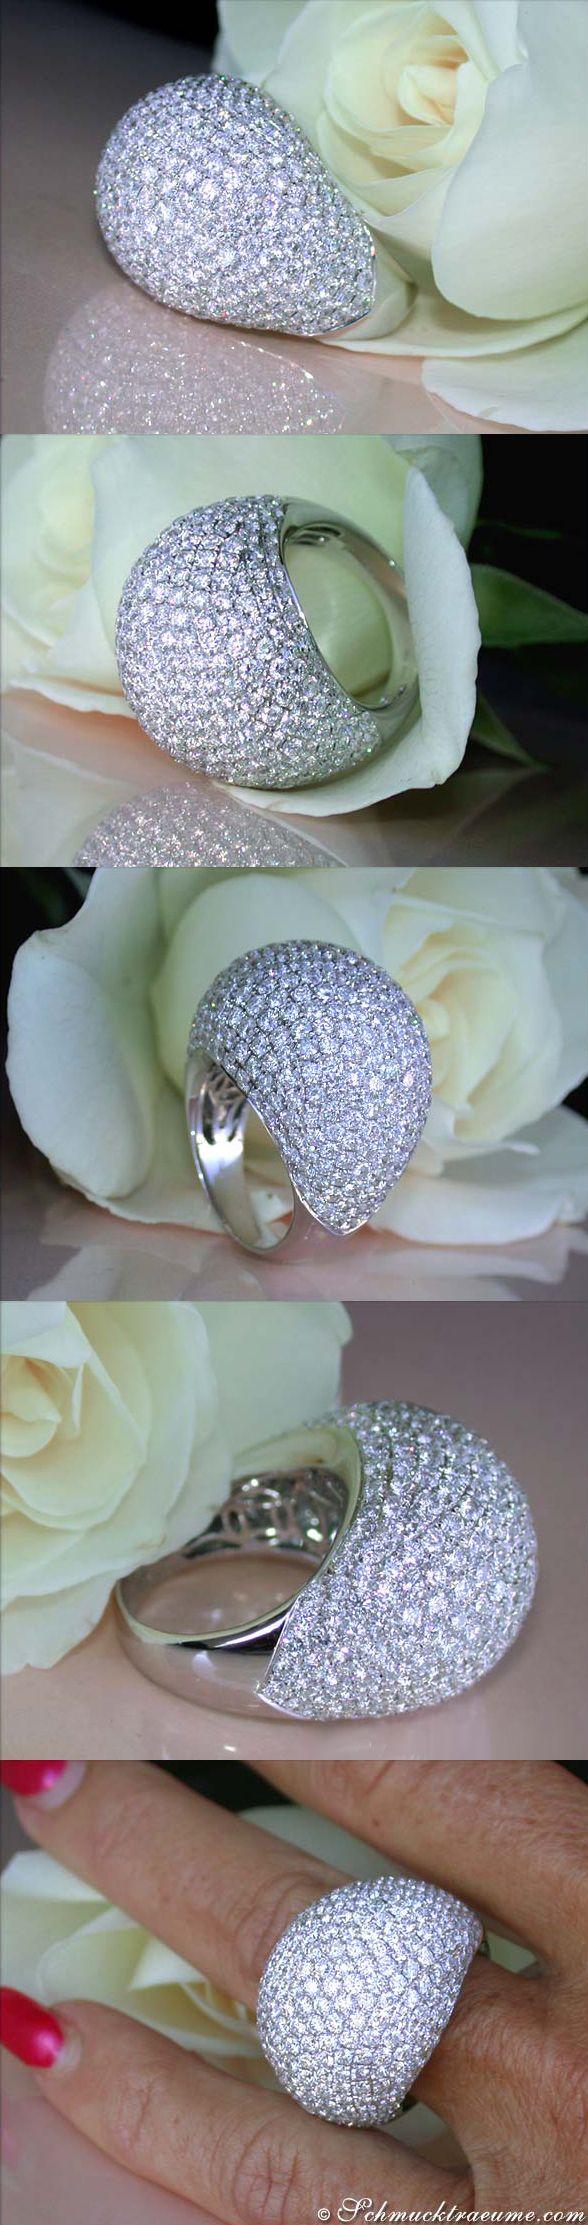 Huge Diamond Dome Ring, 8,19 cts. g-vsi WG18K - Visit: schmucktraeume.com - Like: https://www.facebook.com/pages/Noble-Juwelen/150871984924926 - Mail: info@schmucktraeume.com